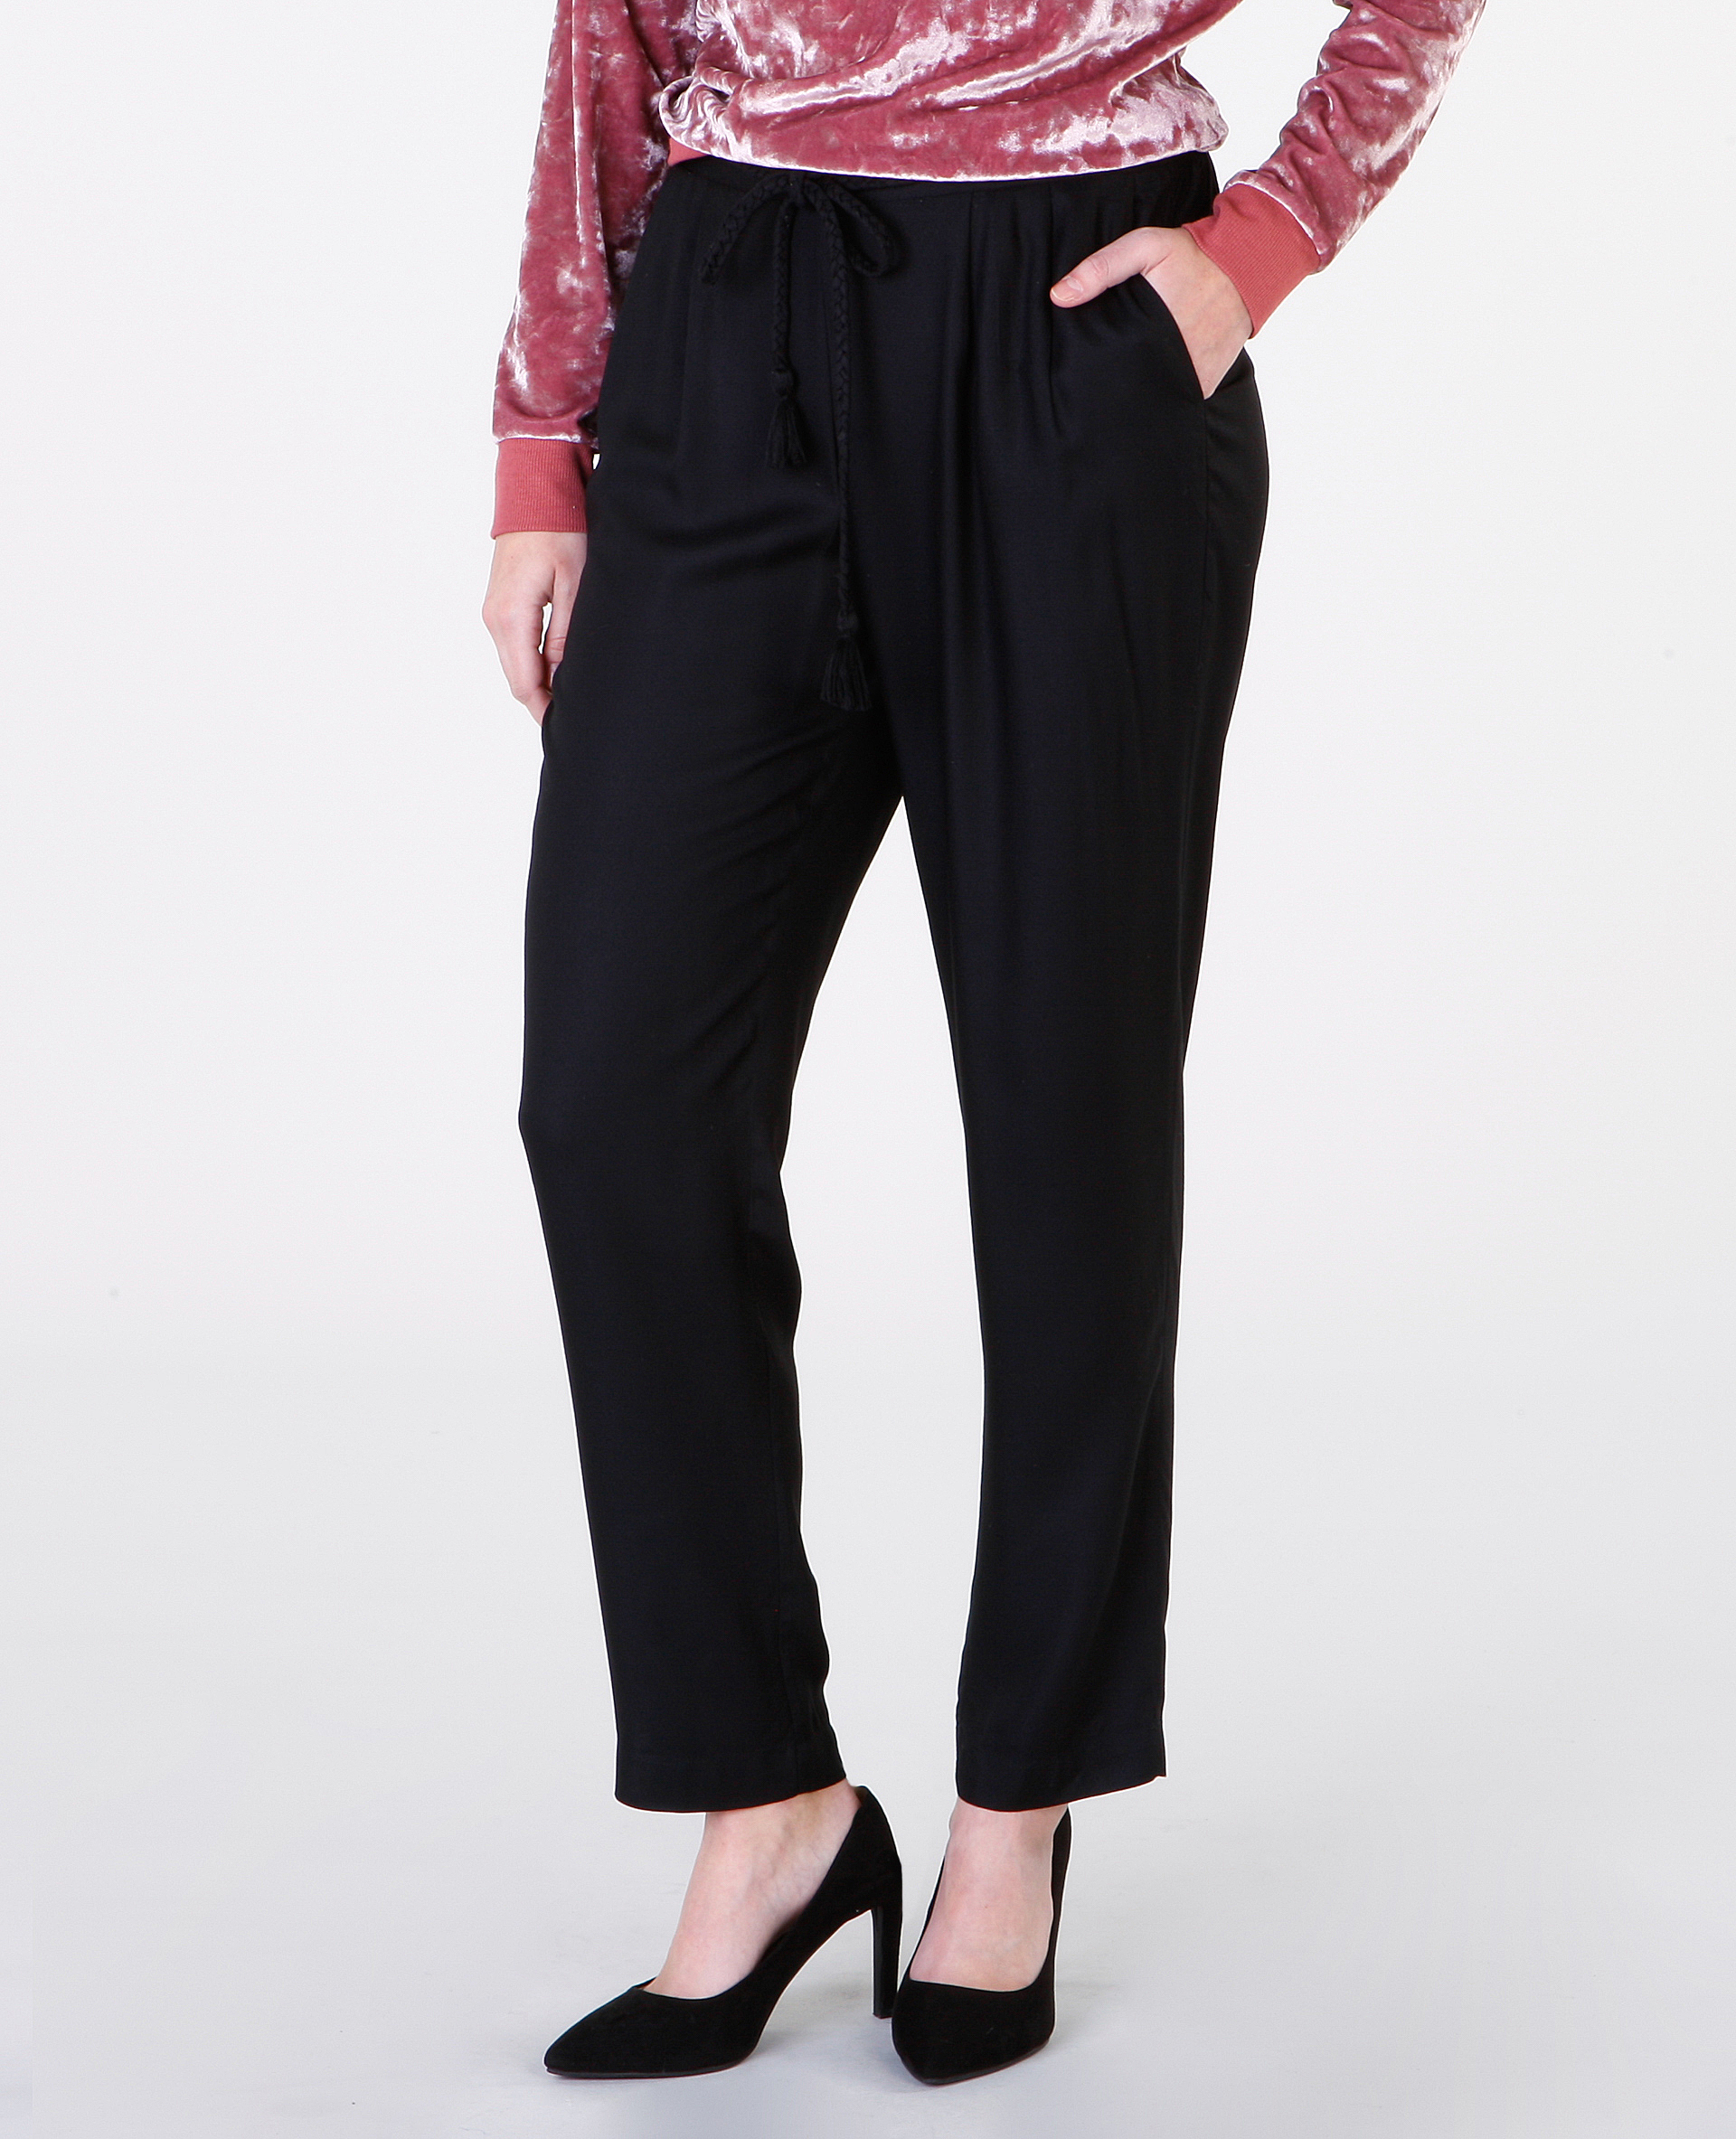 pantalon large fluide fashion designs. Black Bedroom Furniture Sets. Home Design Ideas